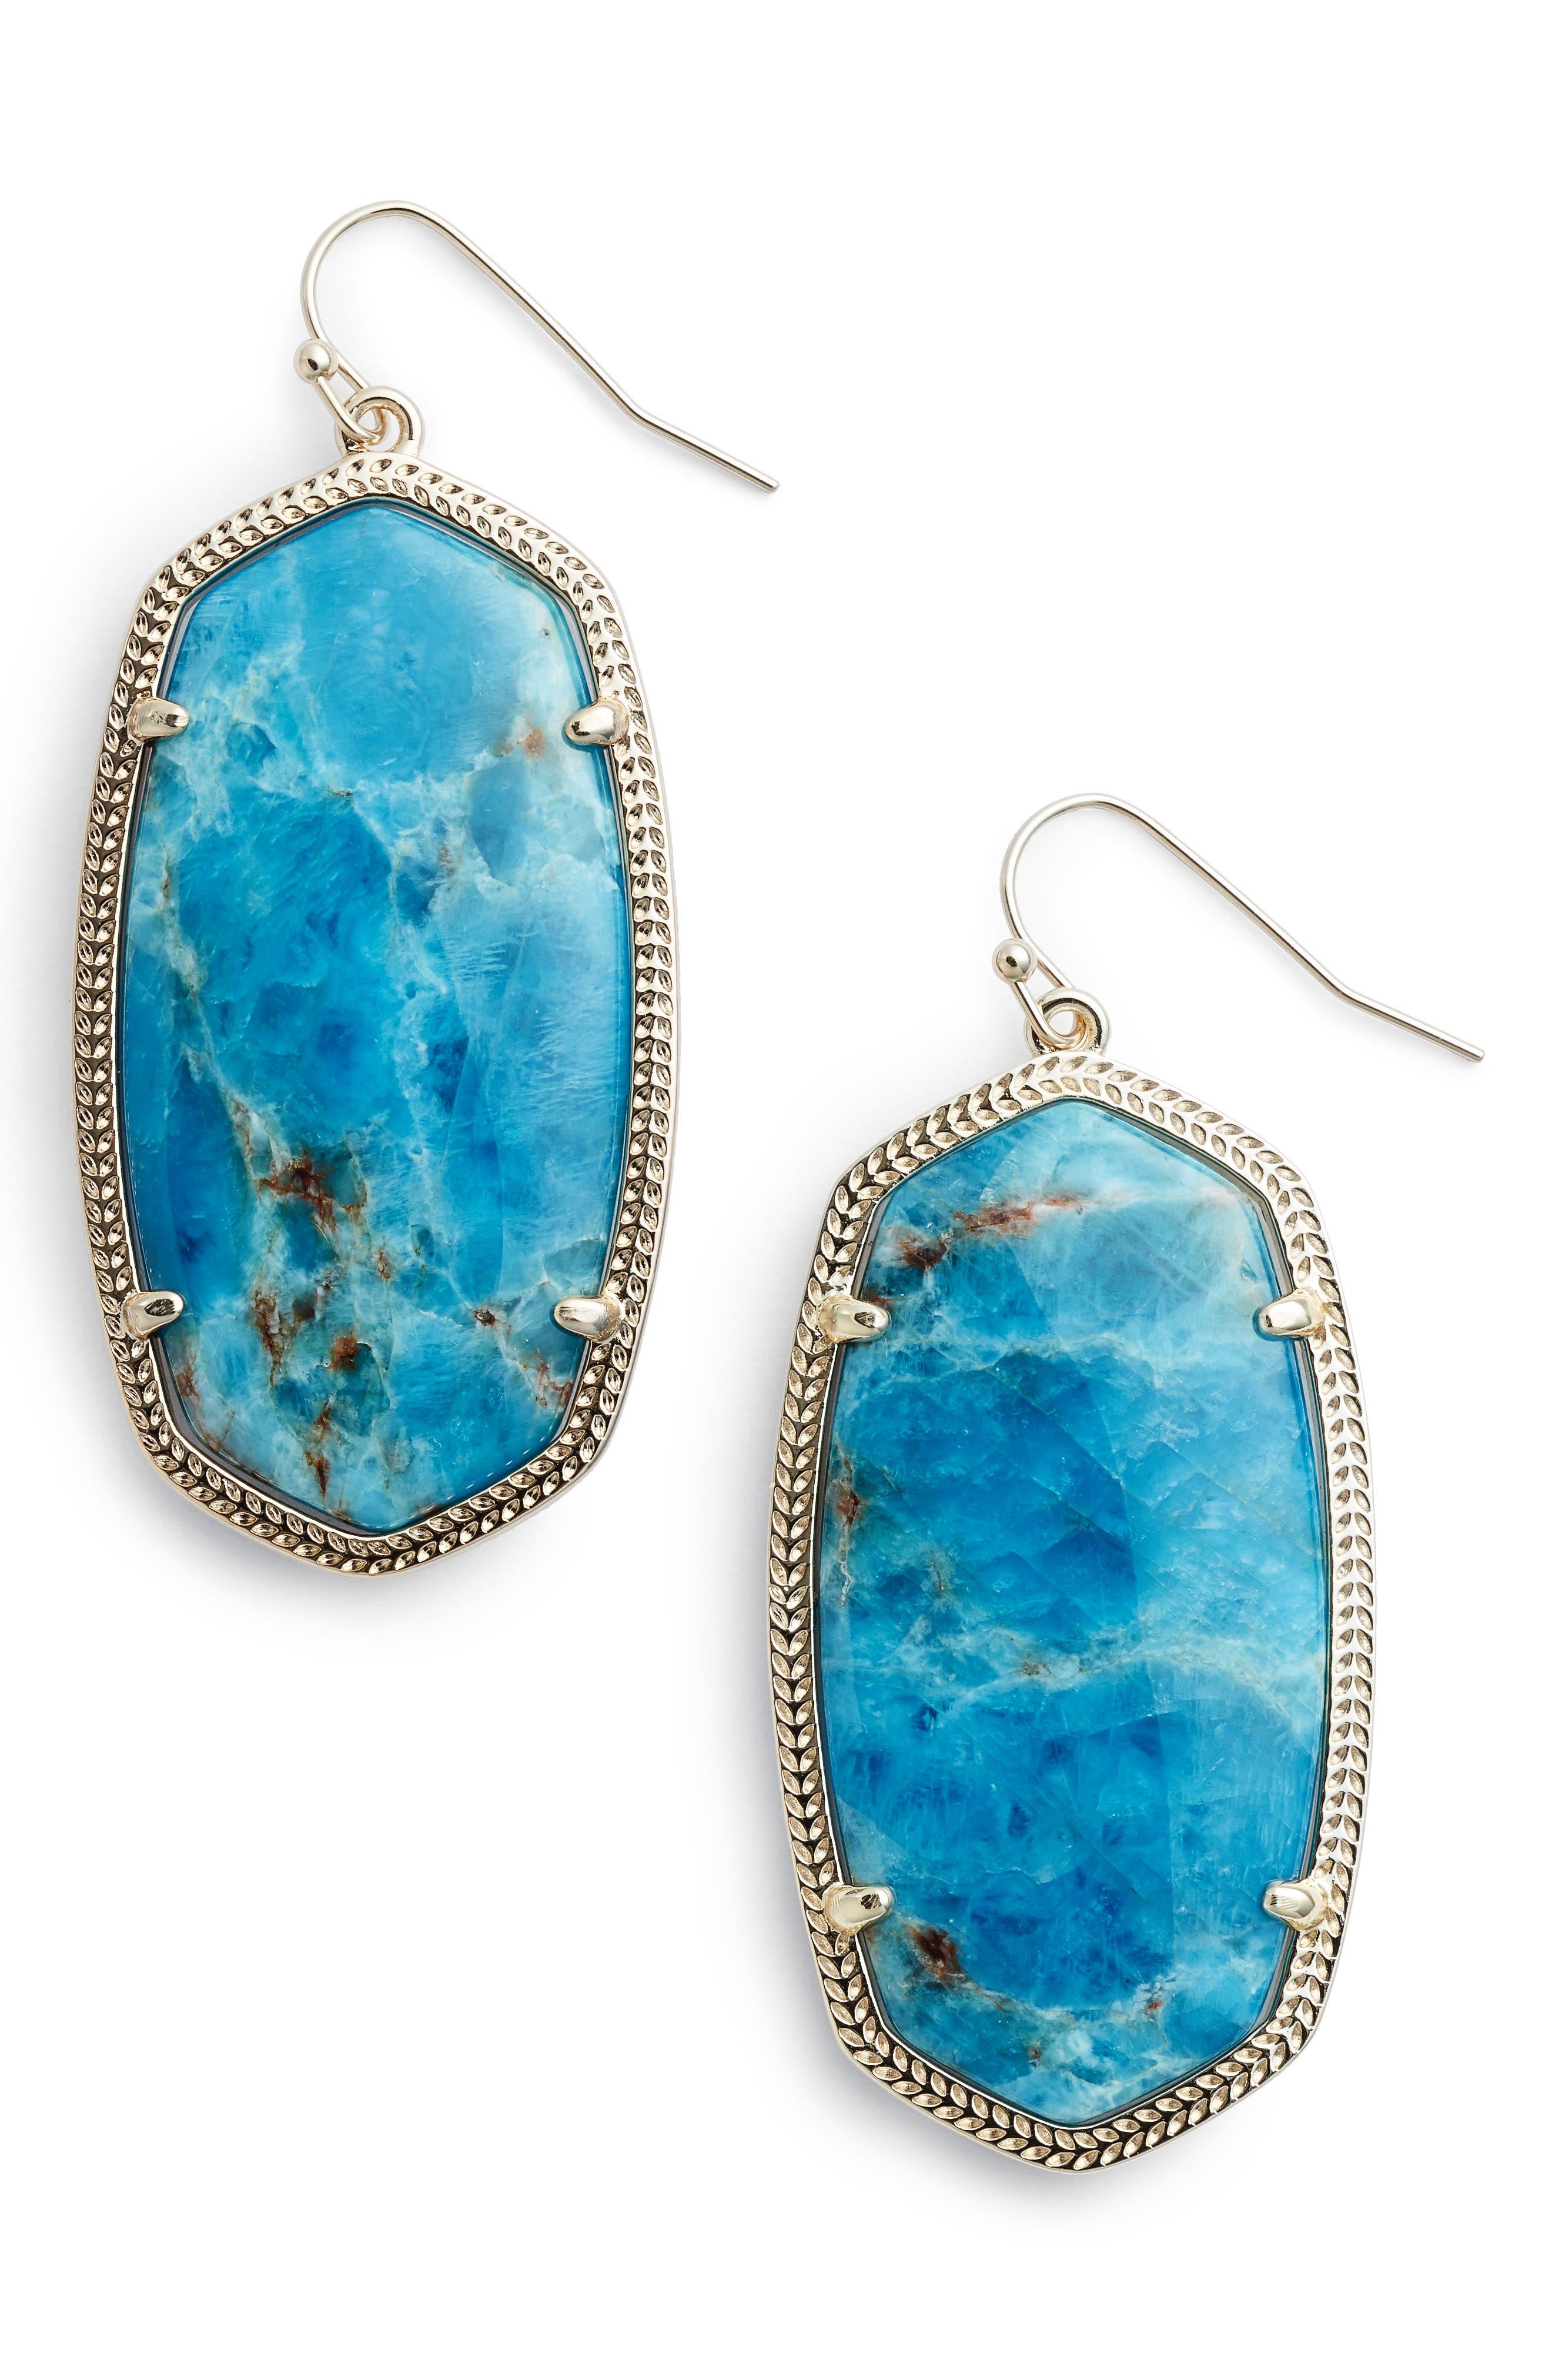 Danielle - Large Oval Statement Earrings,                         Main,                         color, Aqua Apatite/ Brass